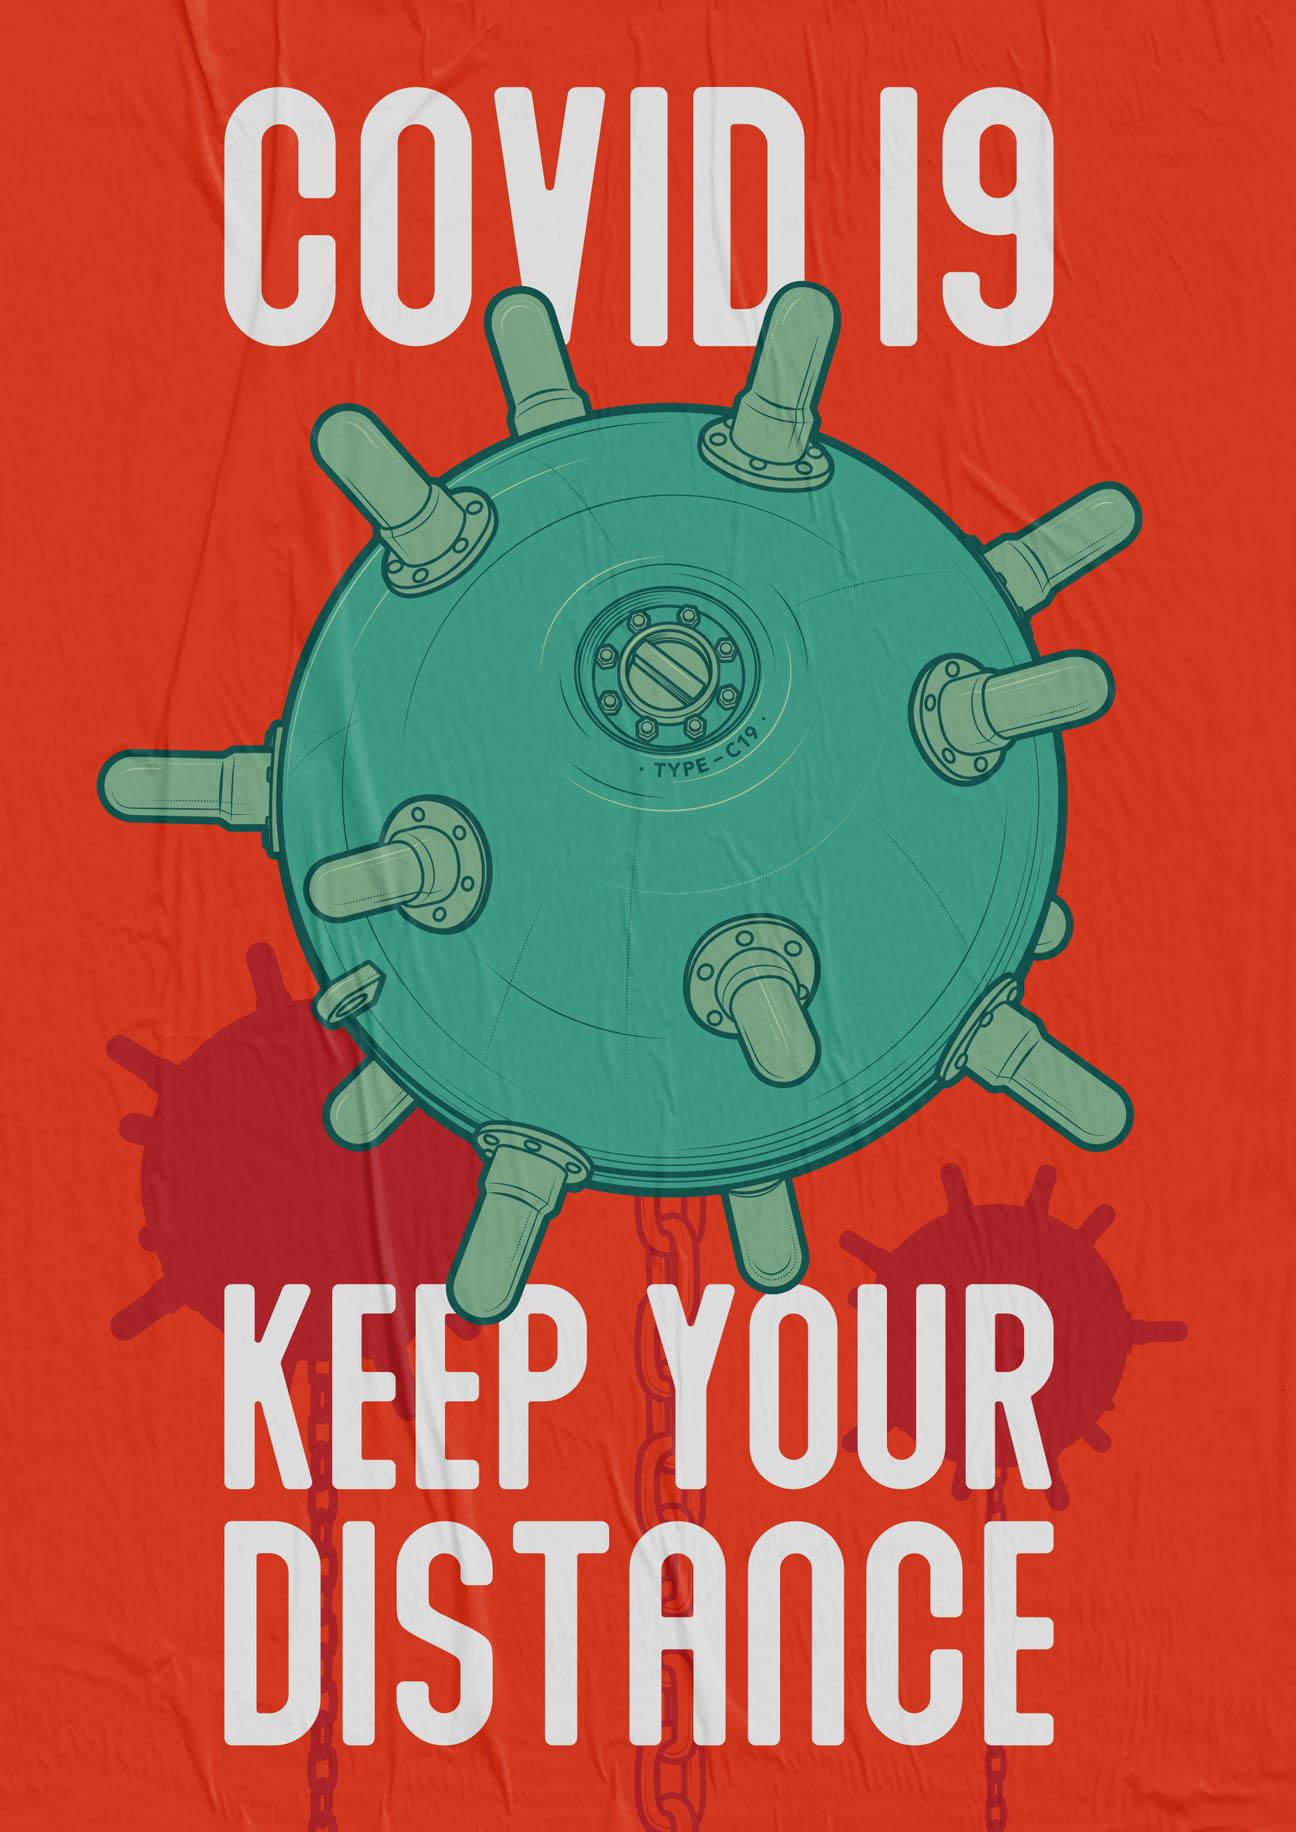 Virus Posters V02 - Covid 19 Poster